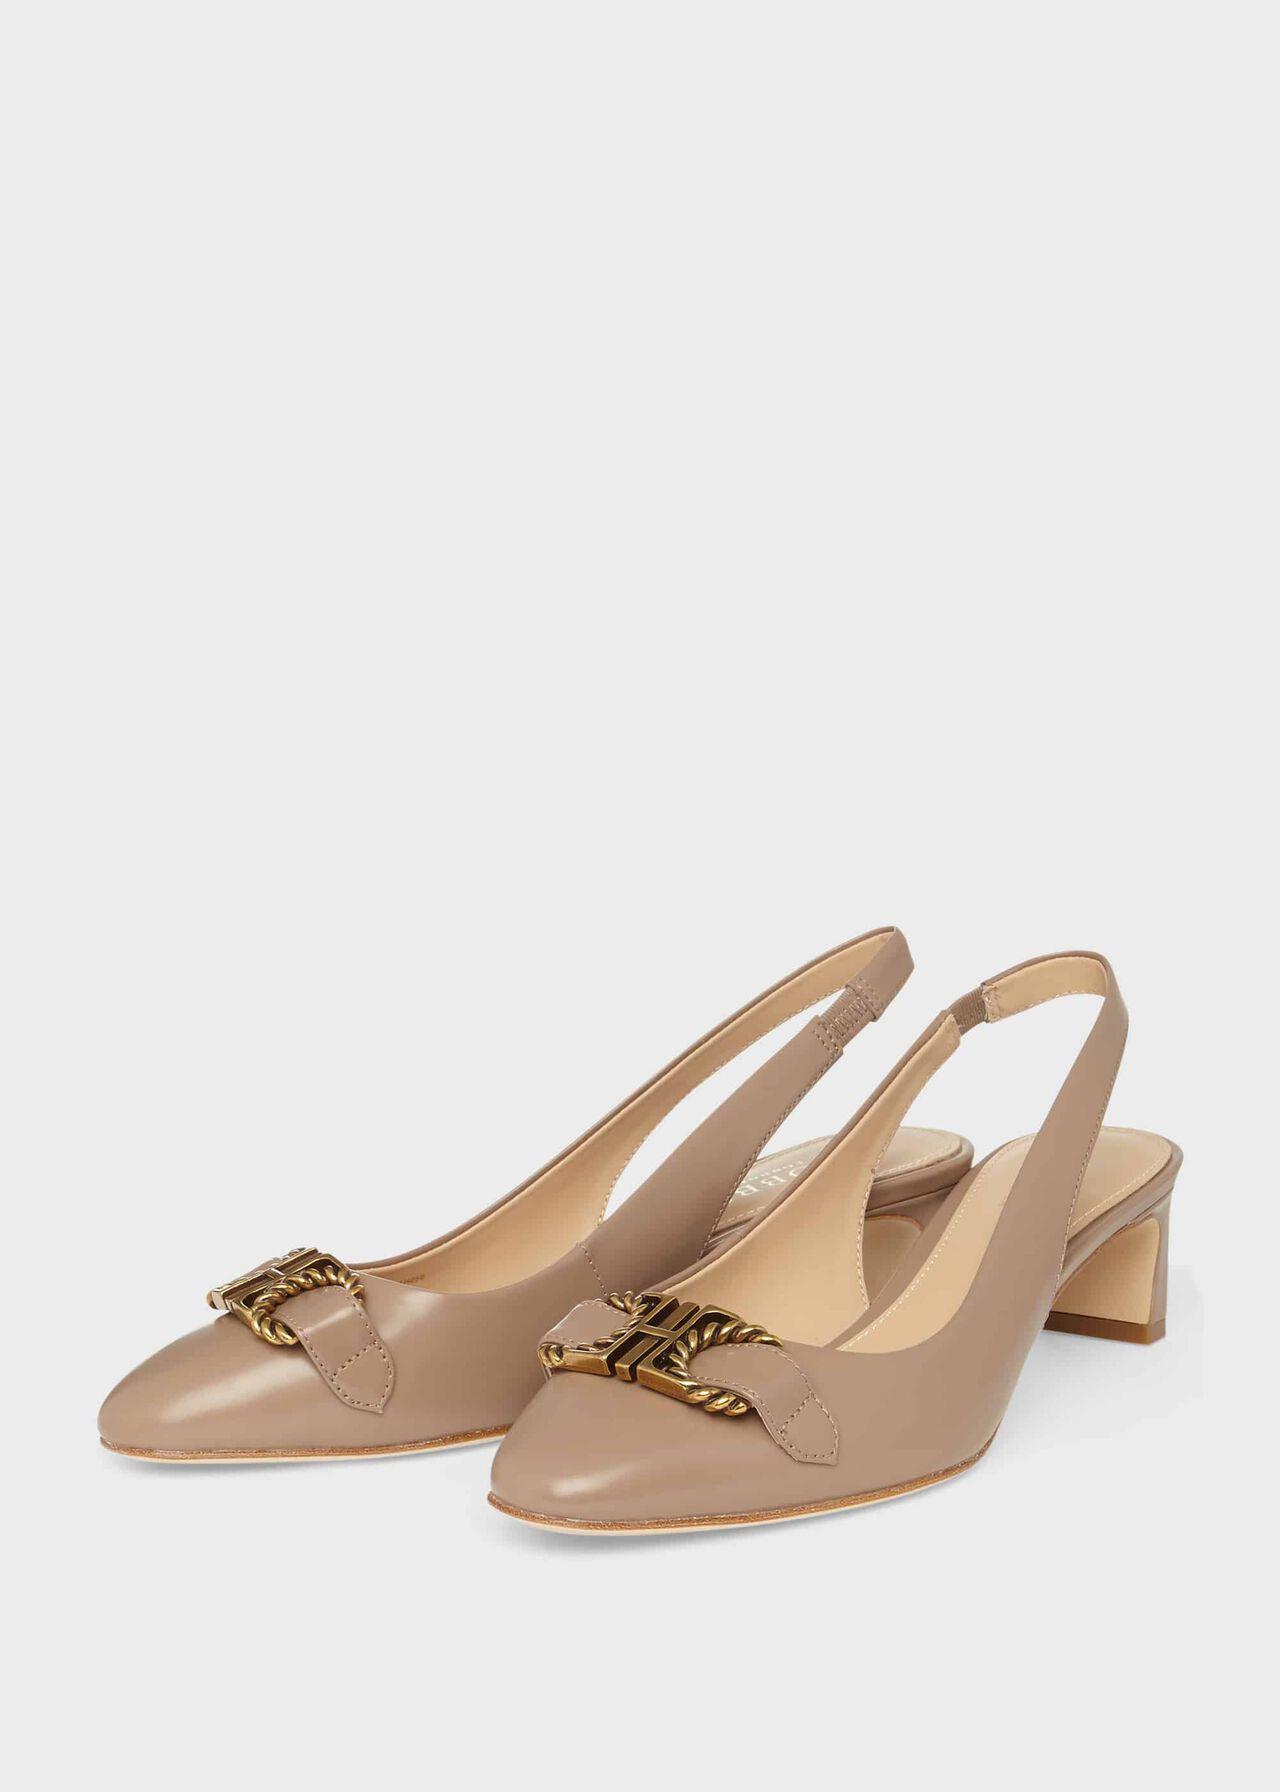 Phoebe Leather Block Heel Slingback Fawn